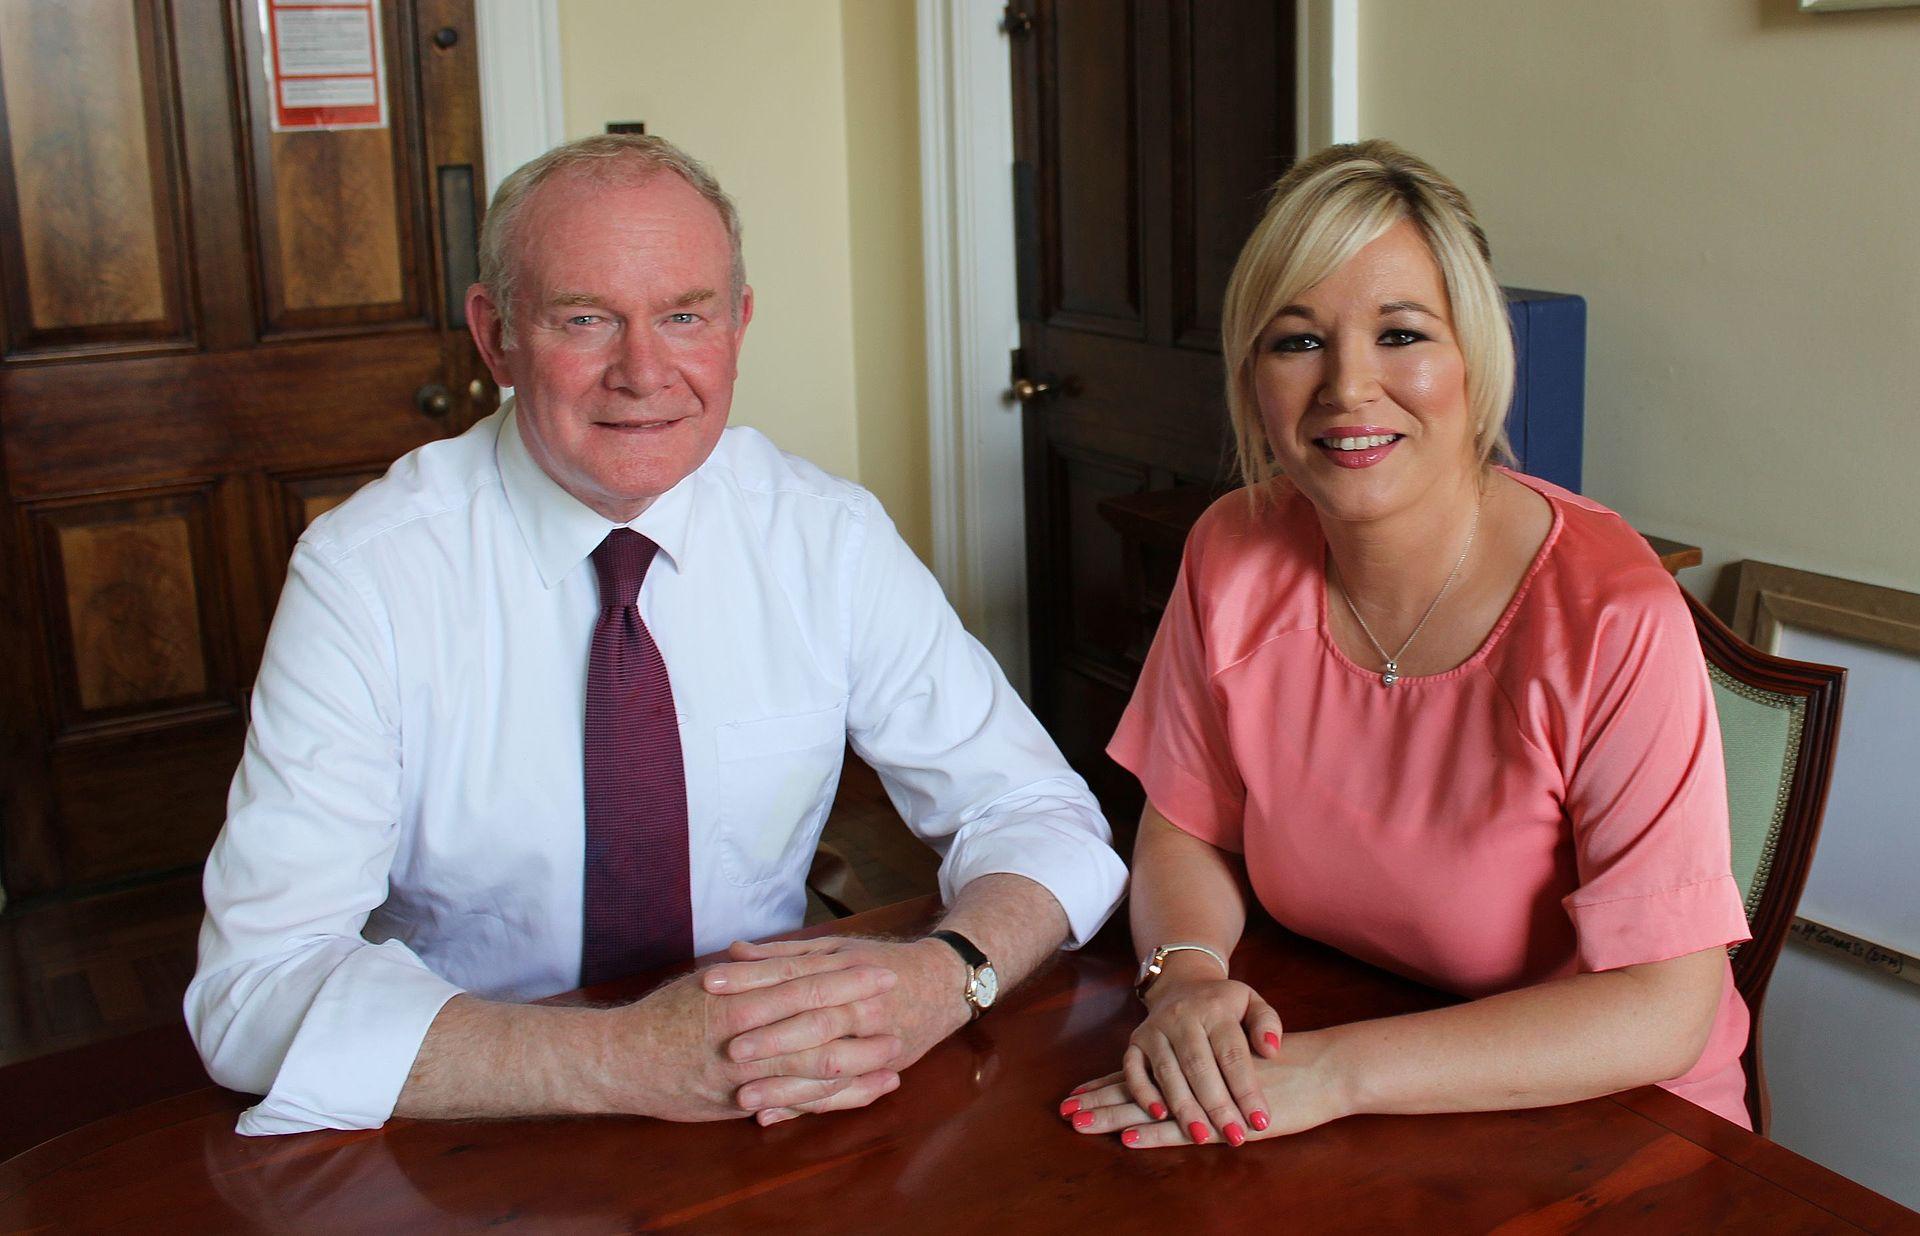 Martin_McGuinness_and_Michelle_O'Neill.jpg